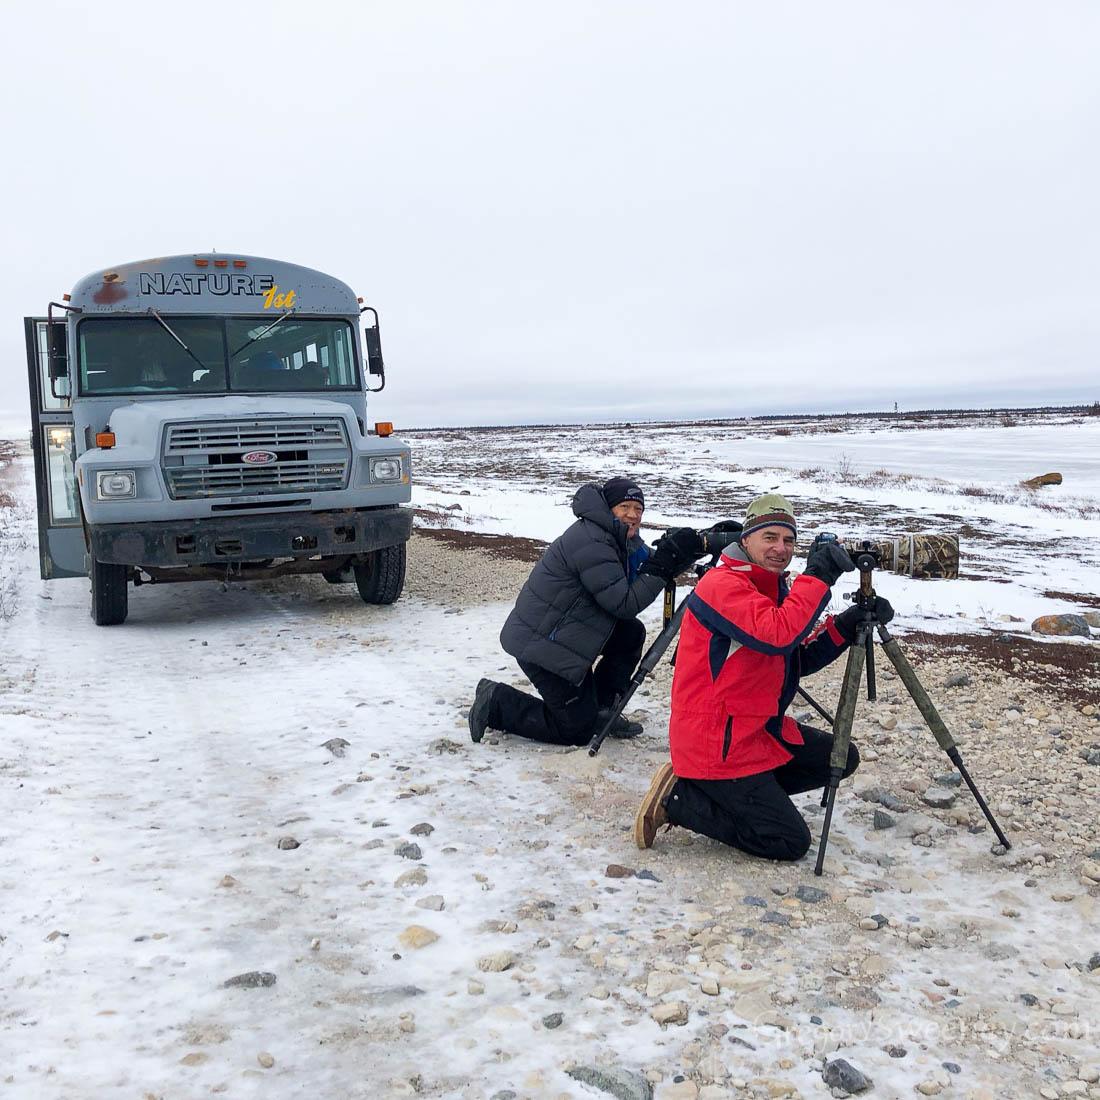 Photographing polar bears